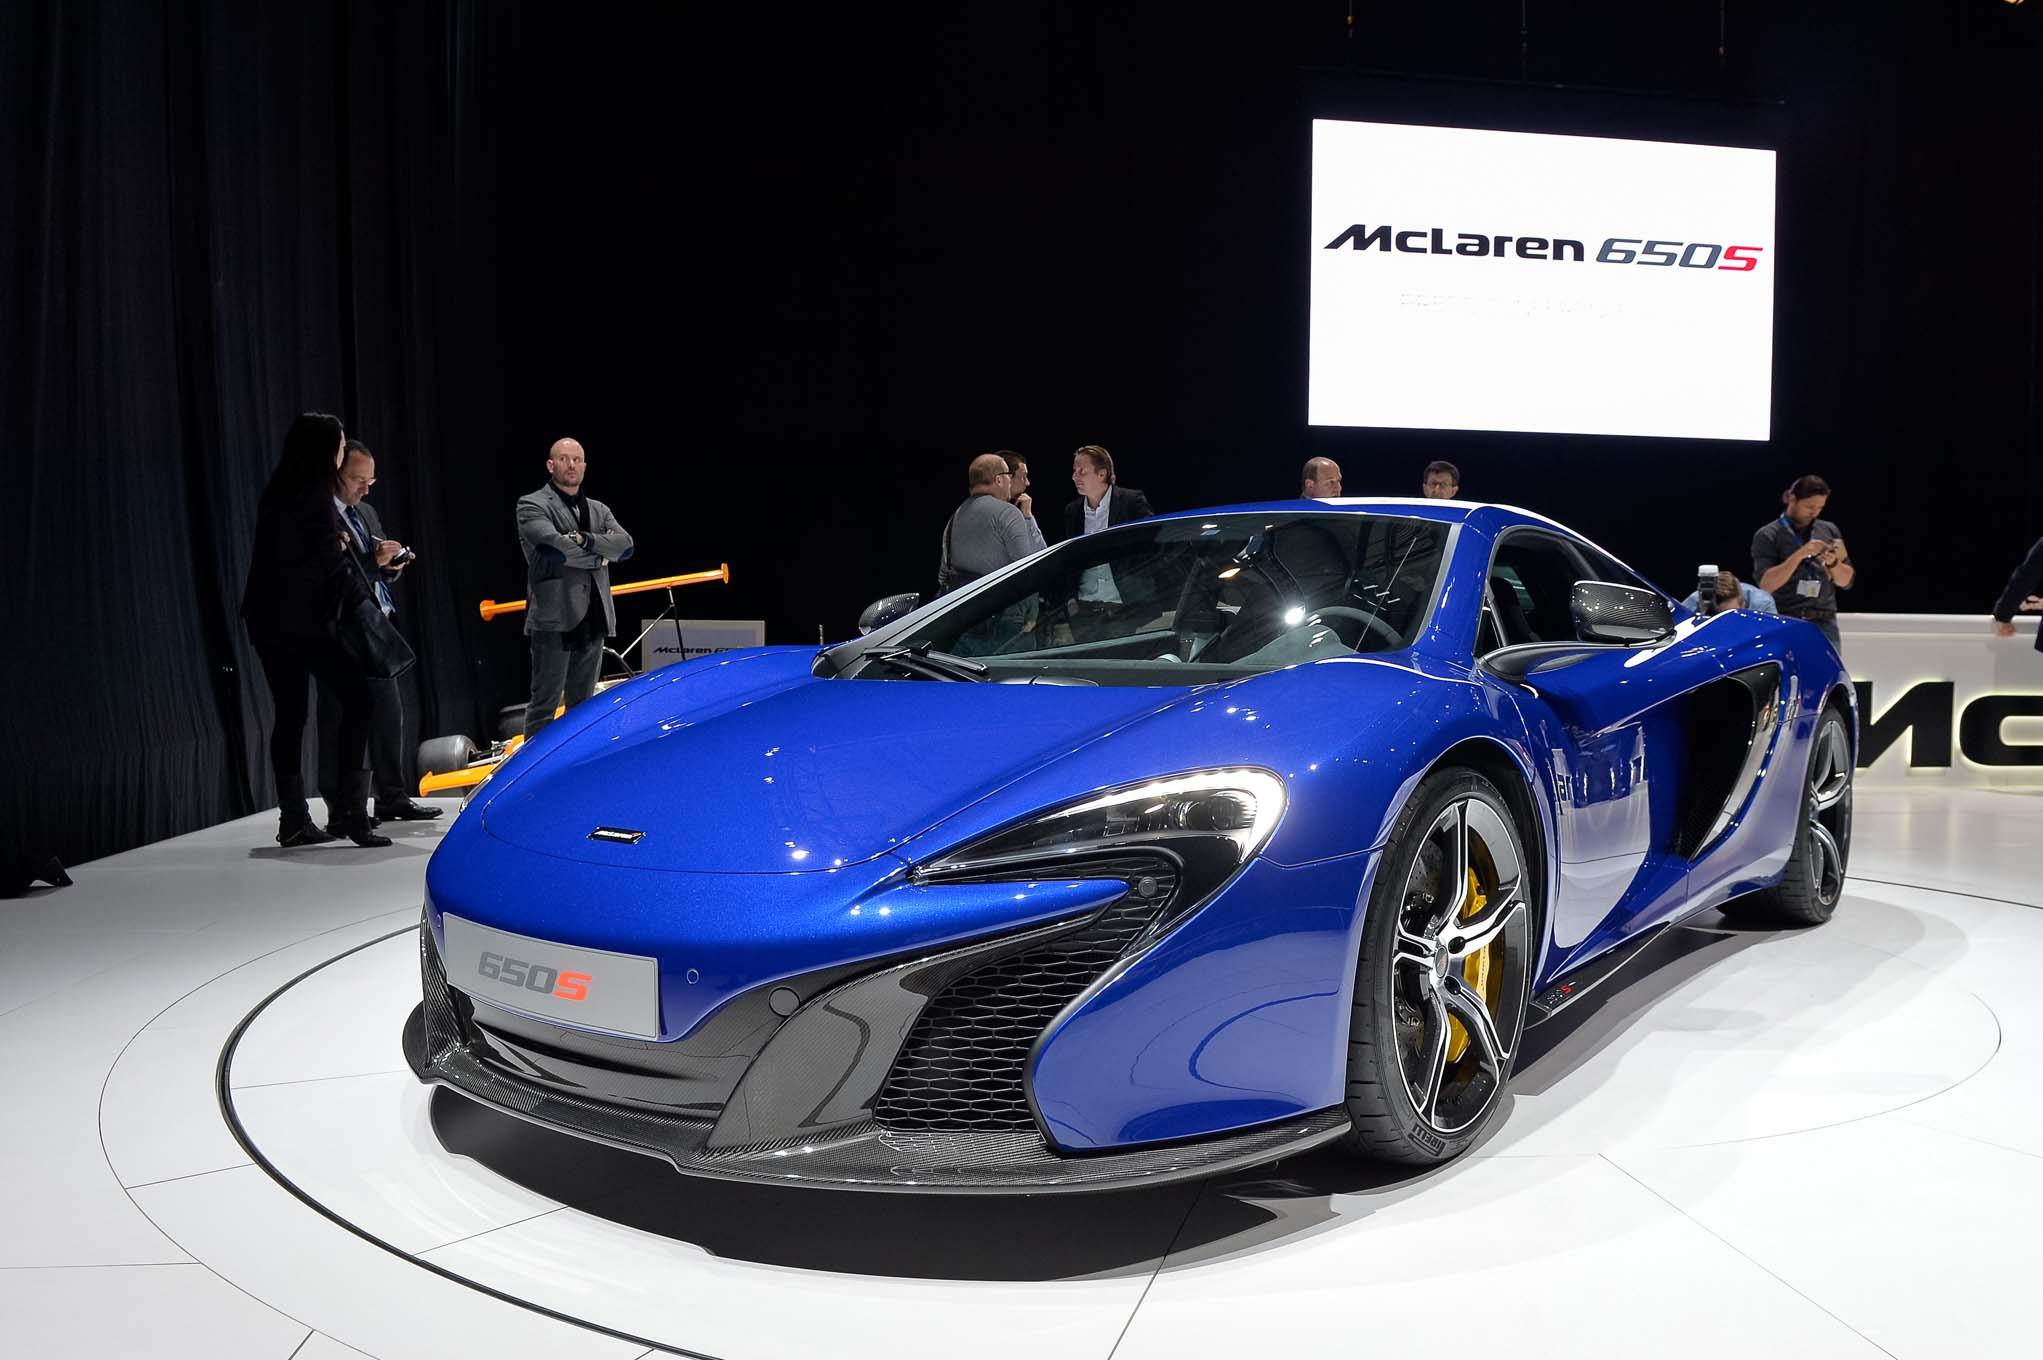 https://st.automobilemag.com/uploads/sites/10/2015/09/2015-Mclaren-650S-front-three-quarters.jpg